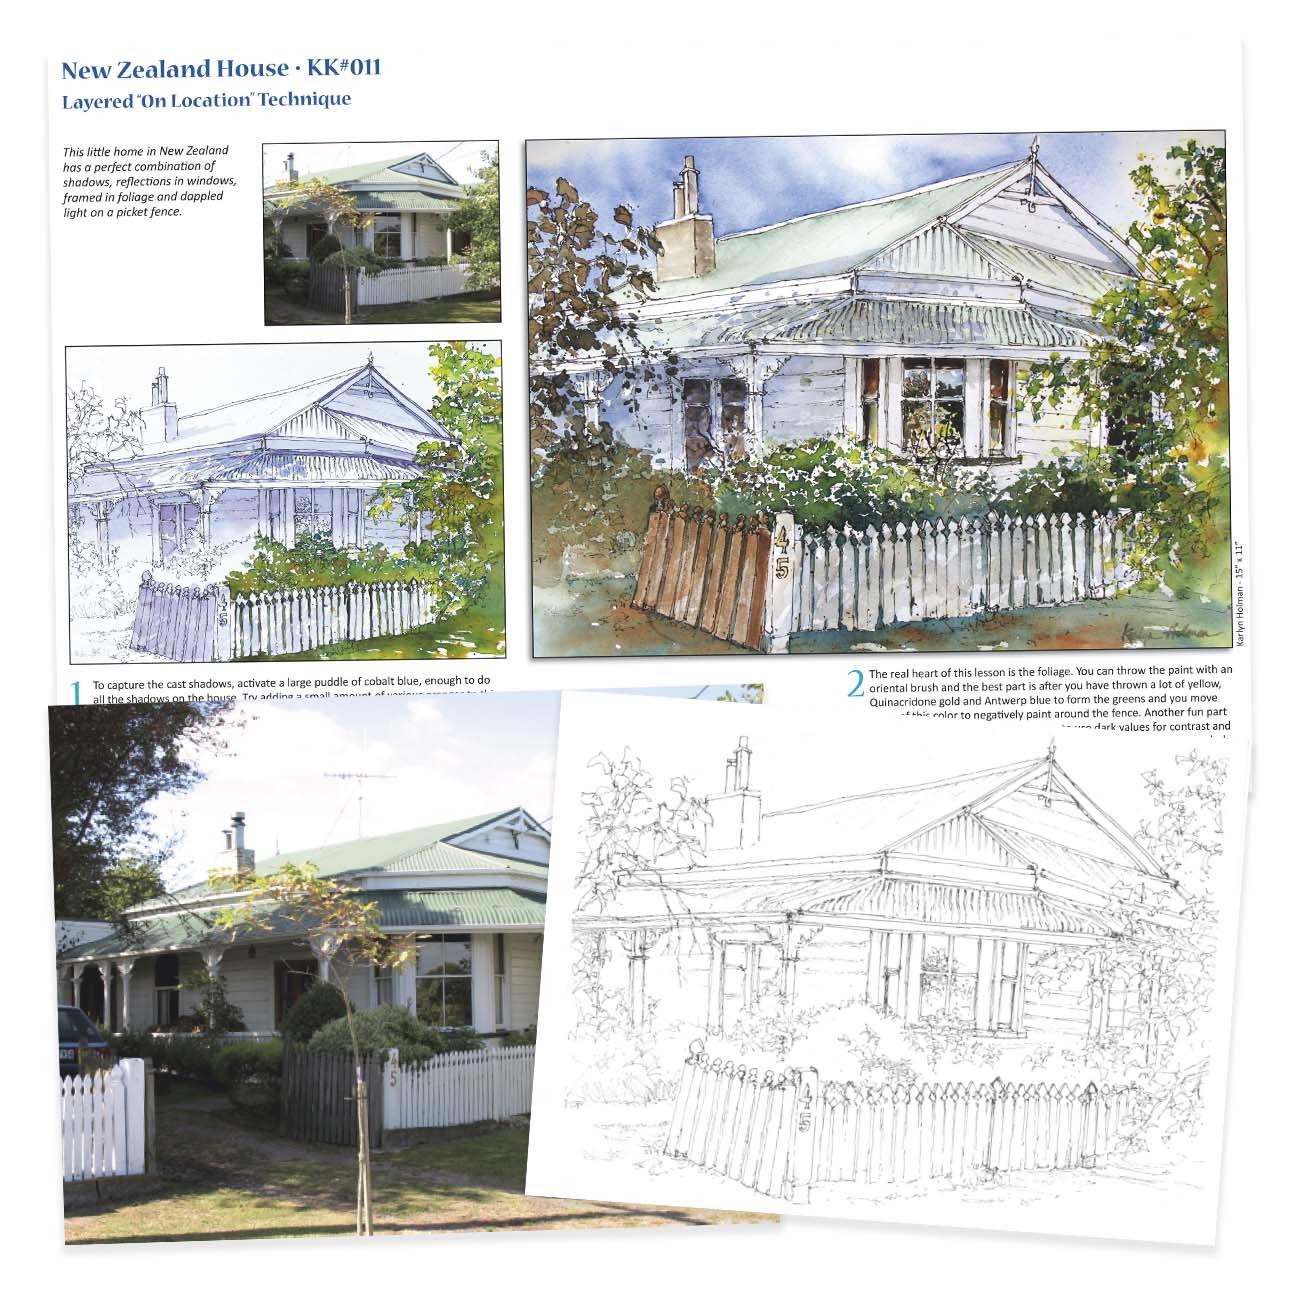 KK011 New Zealand House